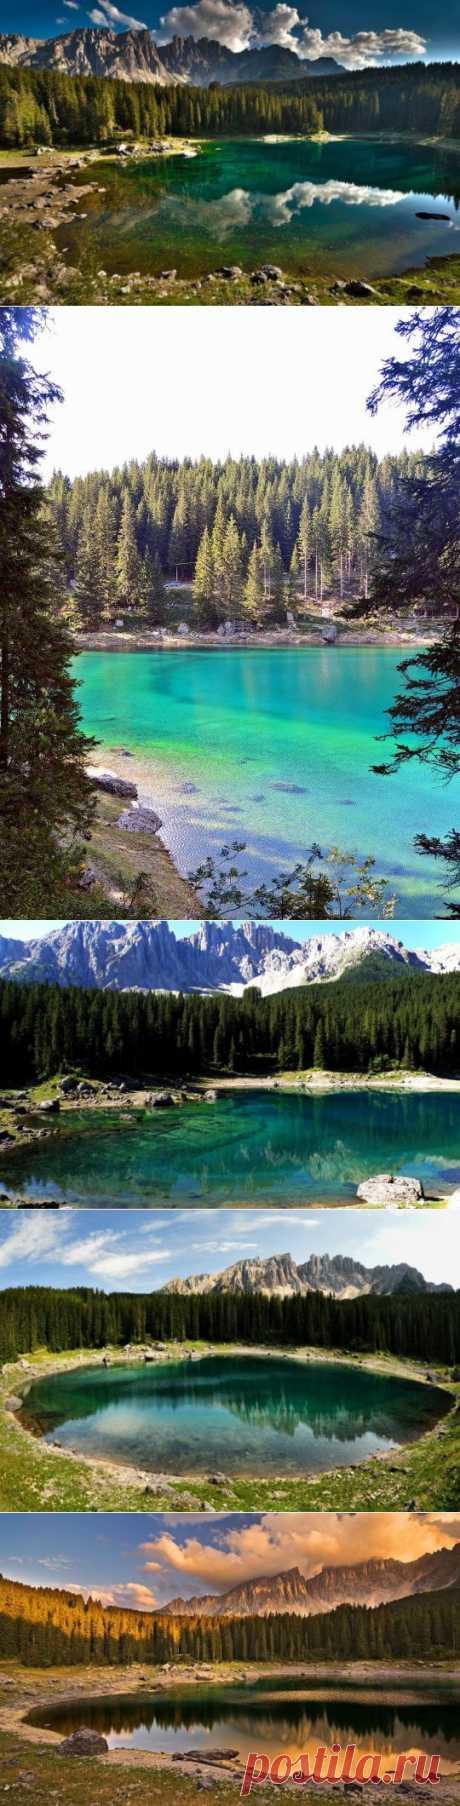 (+1) тема - Озеро Радуги! | НАУКА И ЖИЗНЬ